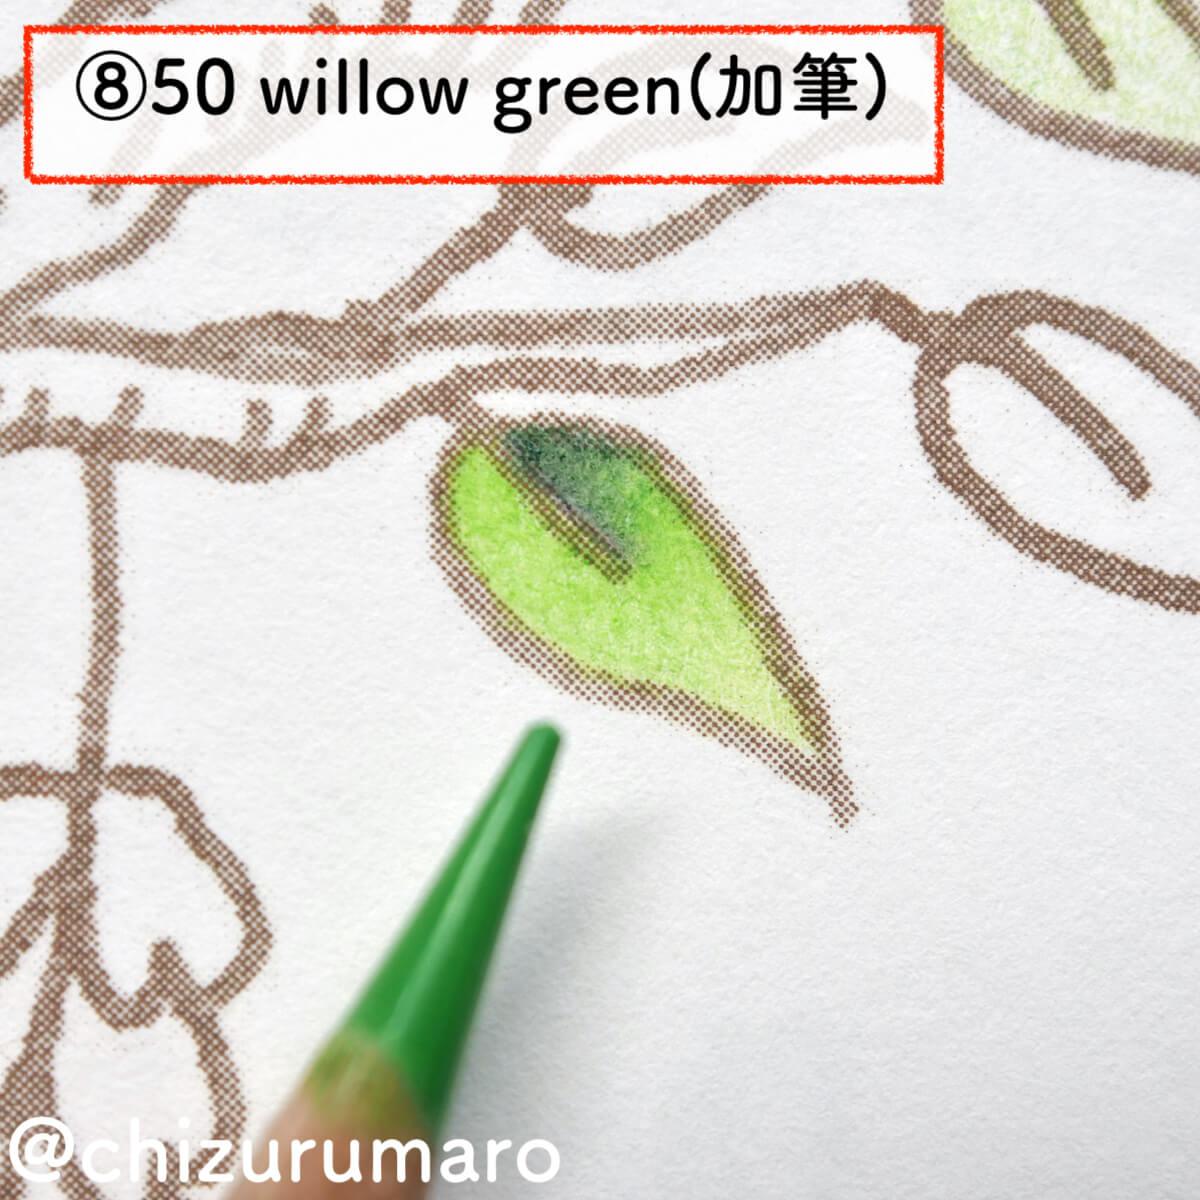 f:id:chizurumaro:20201105213437j:plain